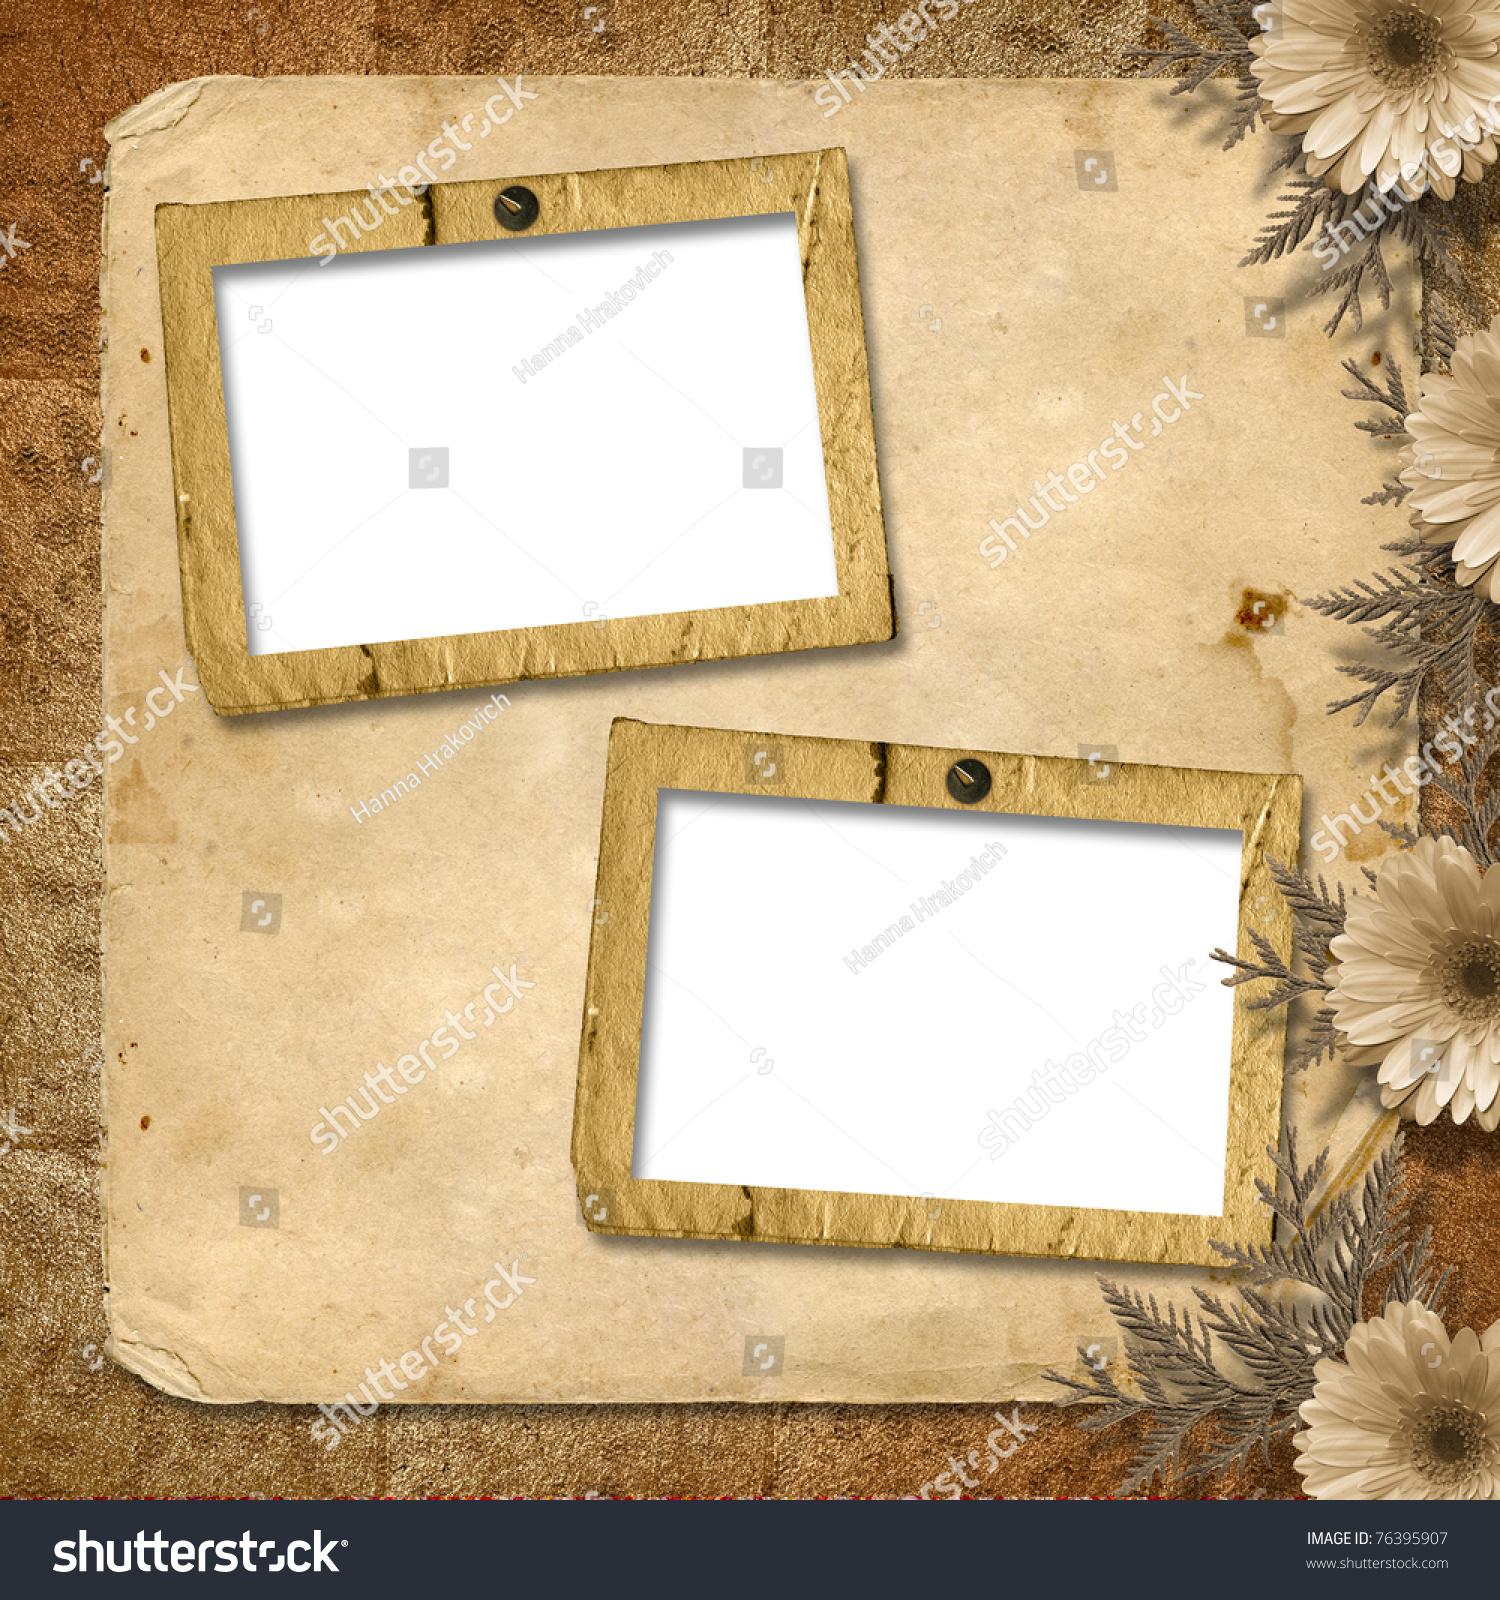 ppt 背景 背景图片 边框 模板 设计 相框 1500_1600